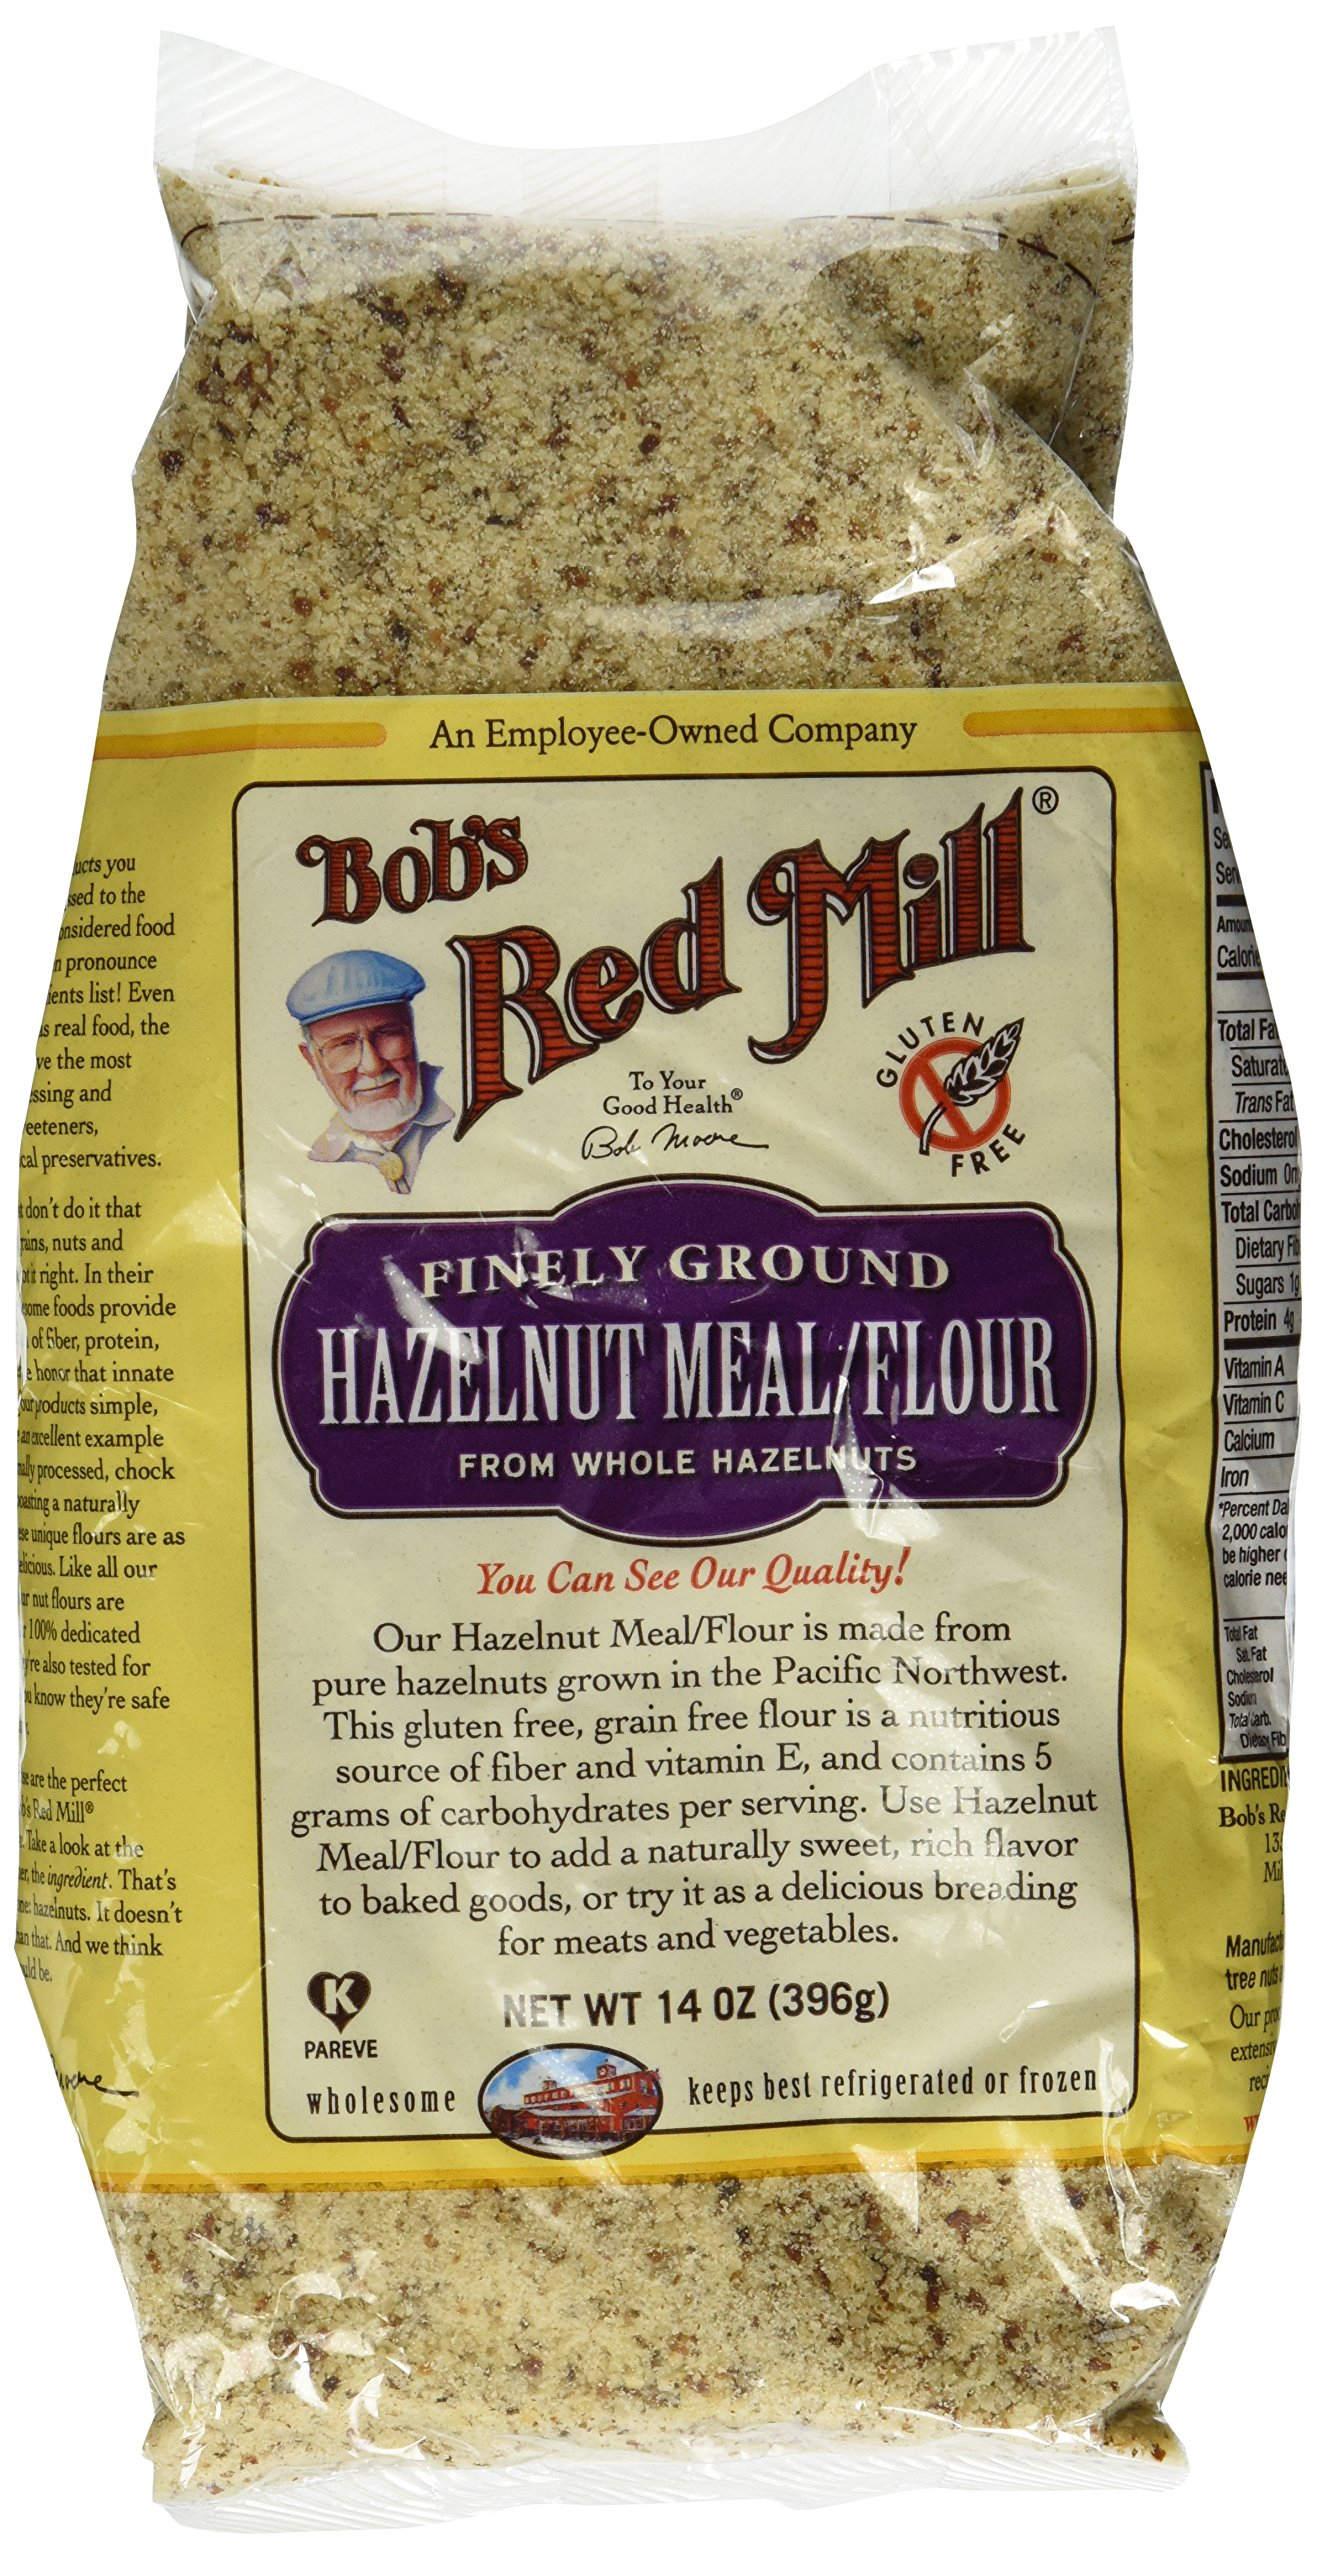 Bob's Red Mill All Natural Hazelnut Meal/Flour - 14 oz